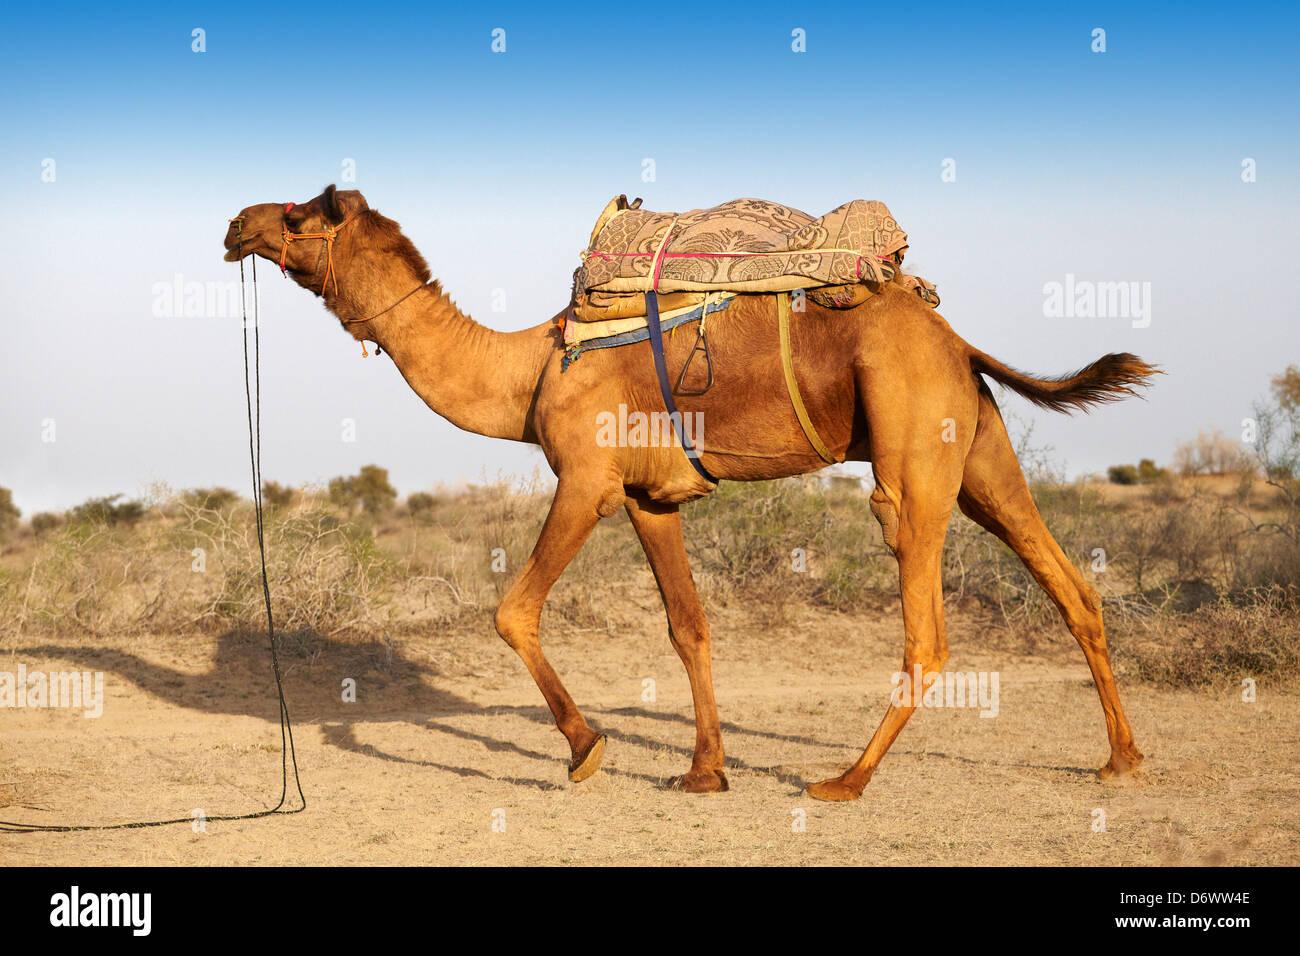 Camello en el desierto de Thar, Rajasthan, India Imagen De Stock